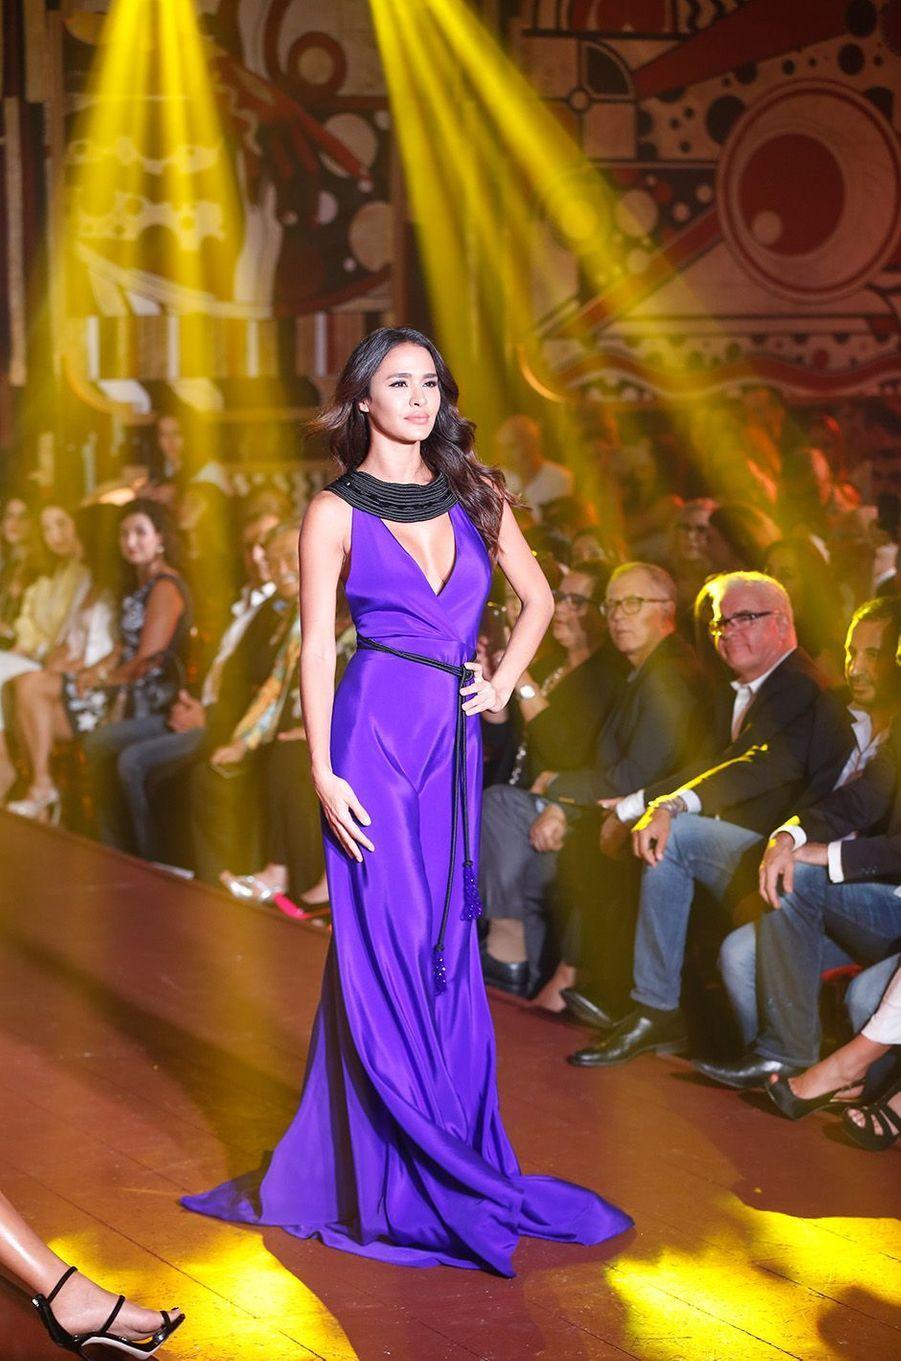 Leila Ben KhalifaauCasa Fashion Show, le samedi 7 octobre 2017.